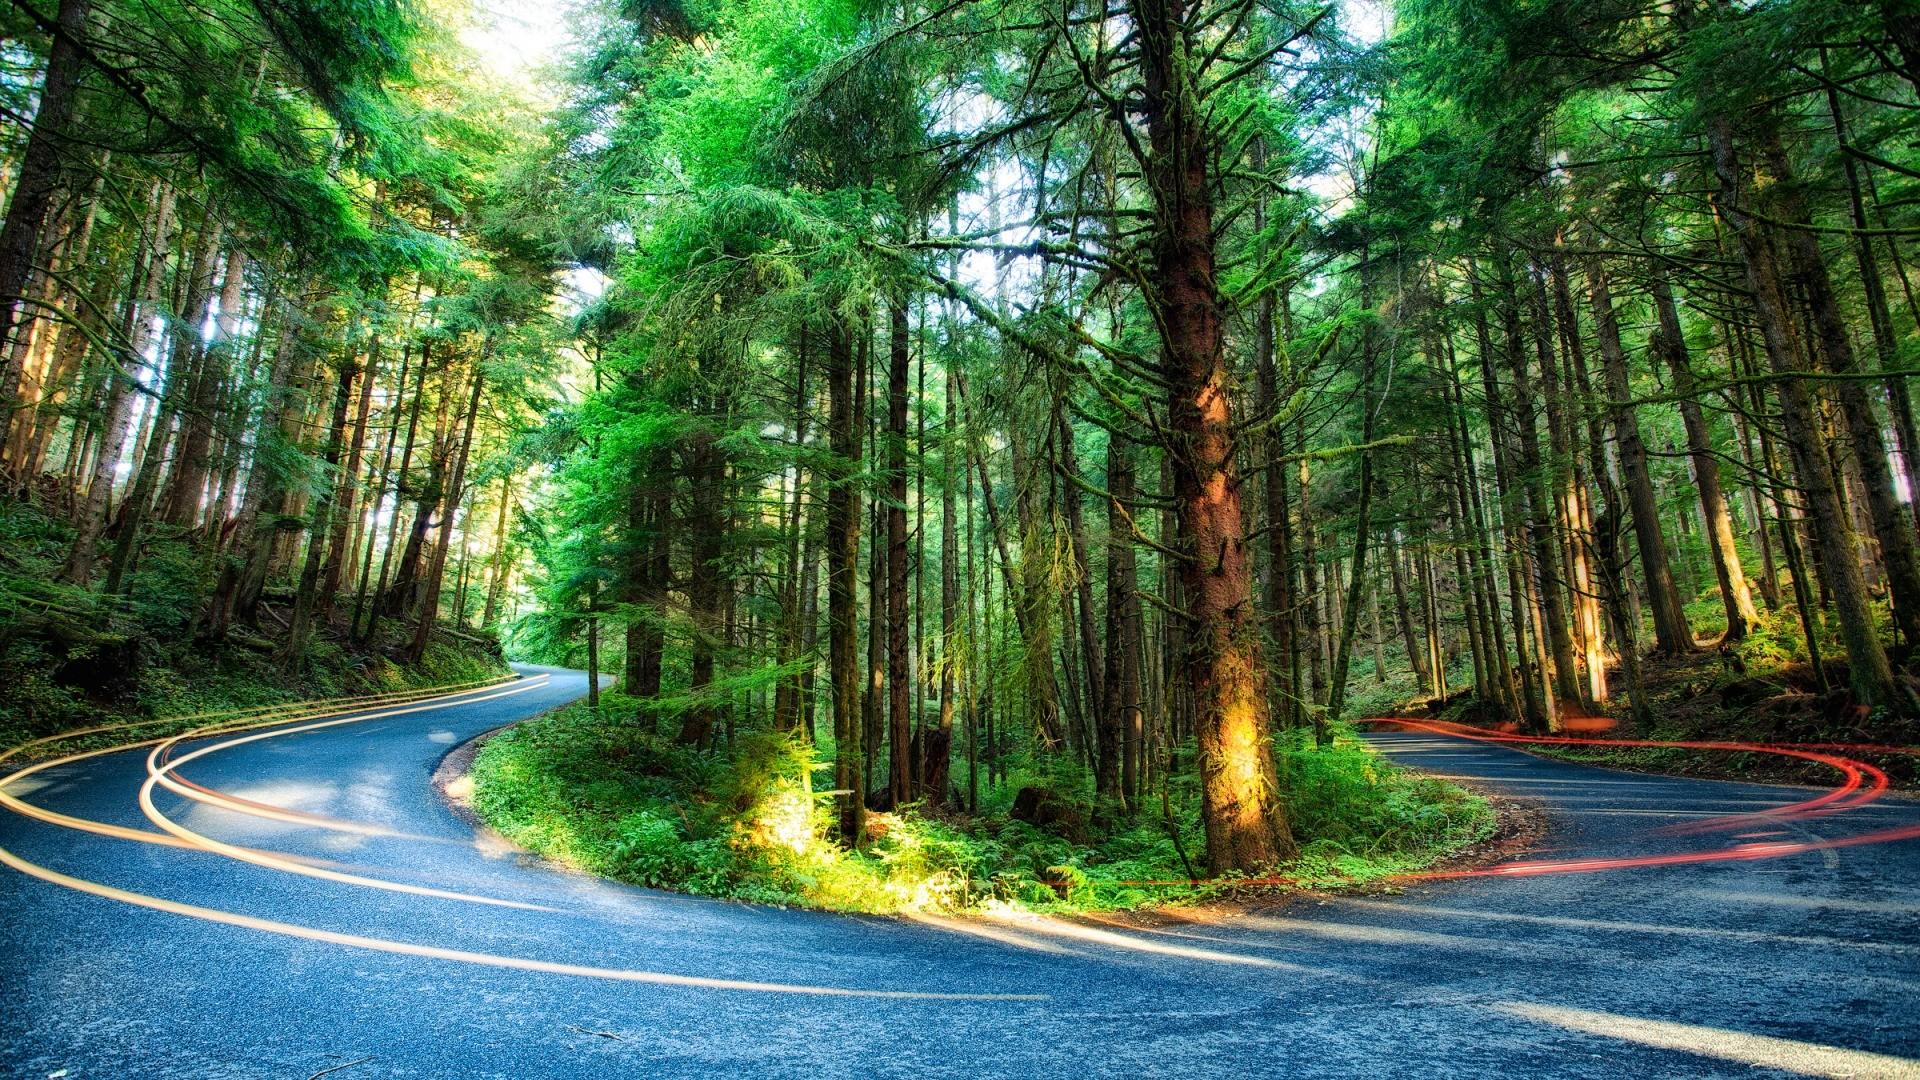 Wallpaper : sunlight, colorful, nature, plants, road, long exposure ...